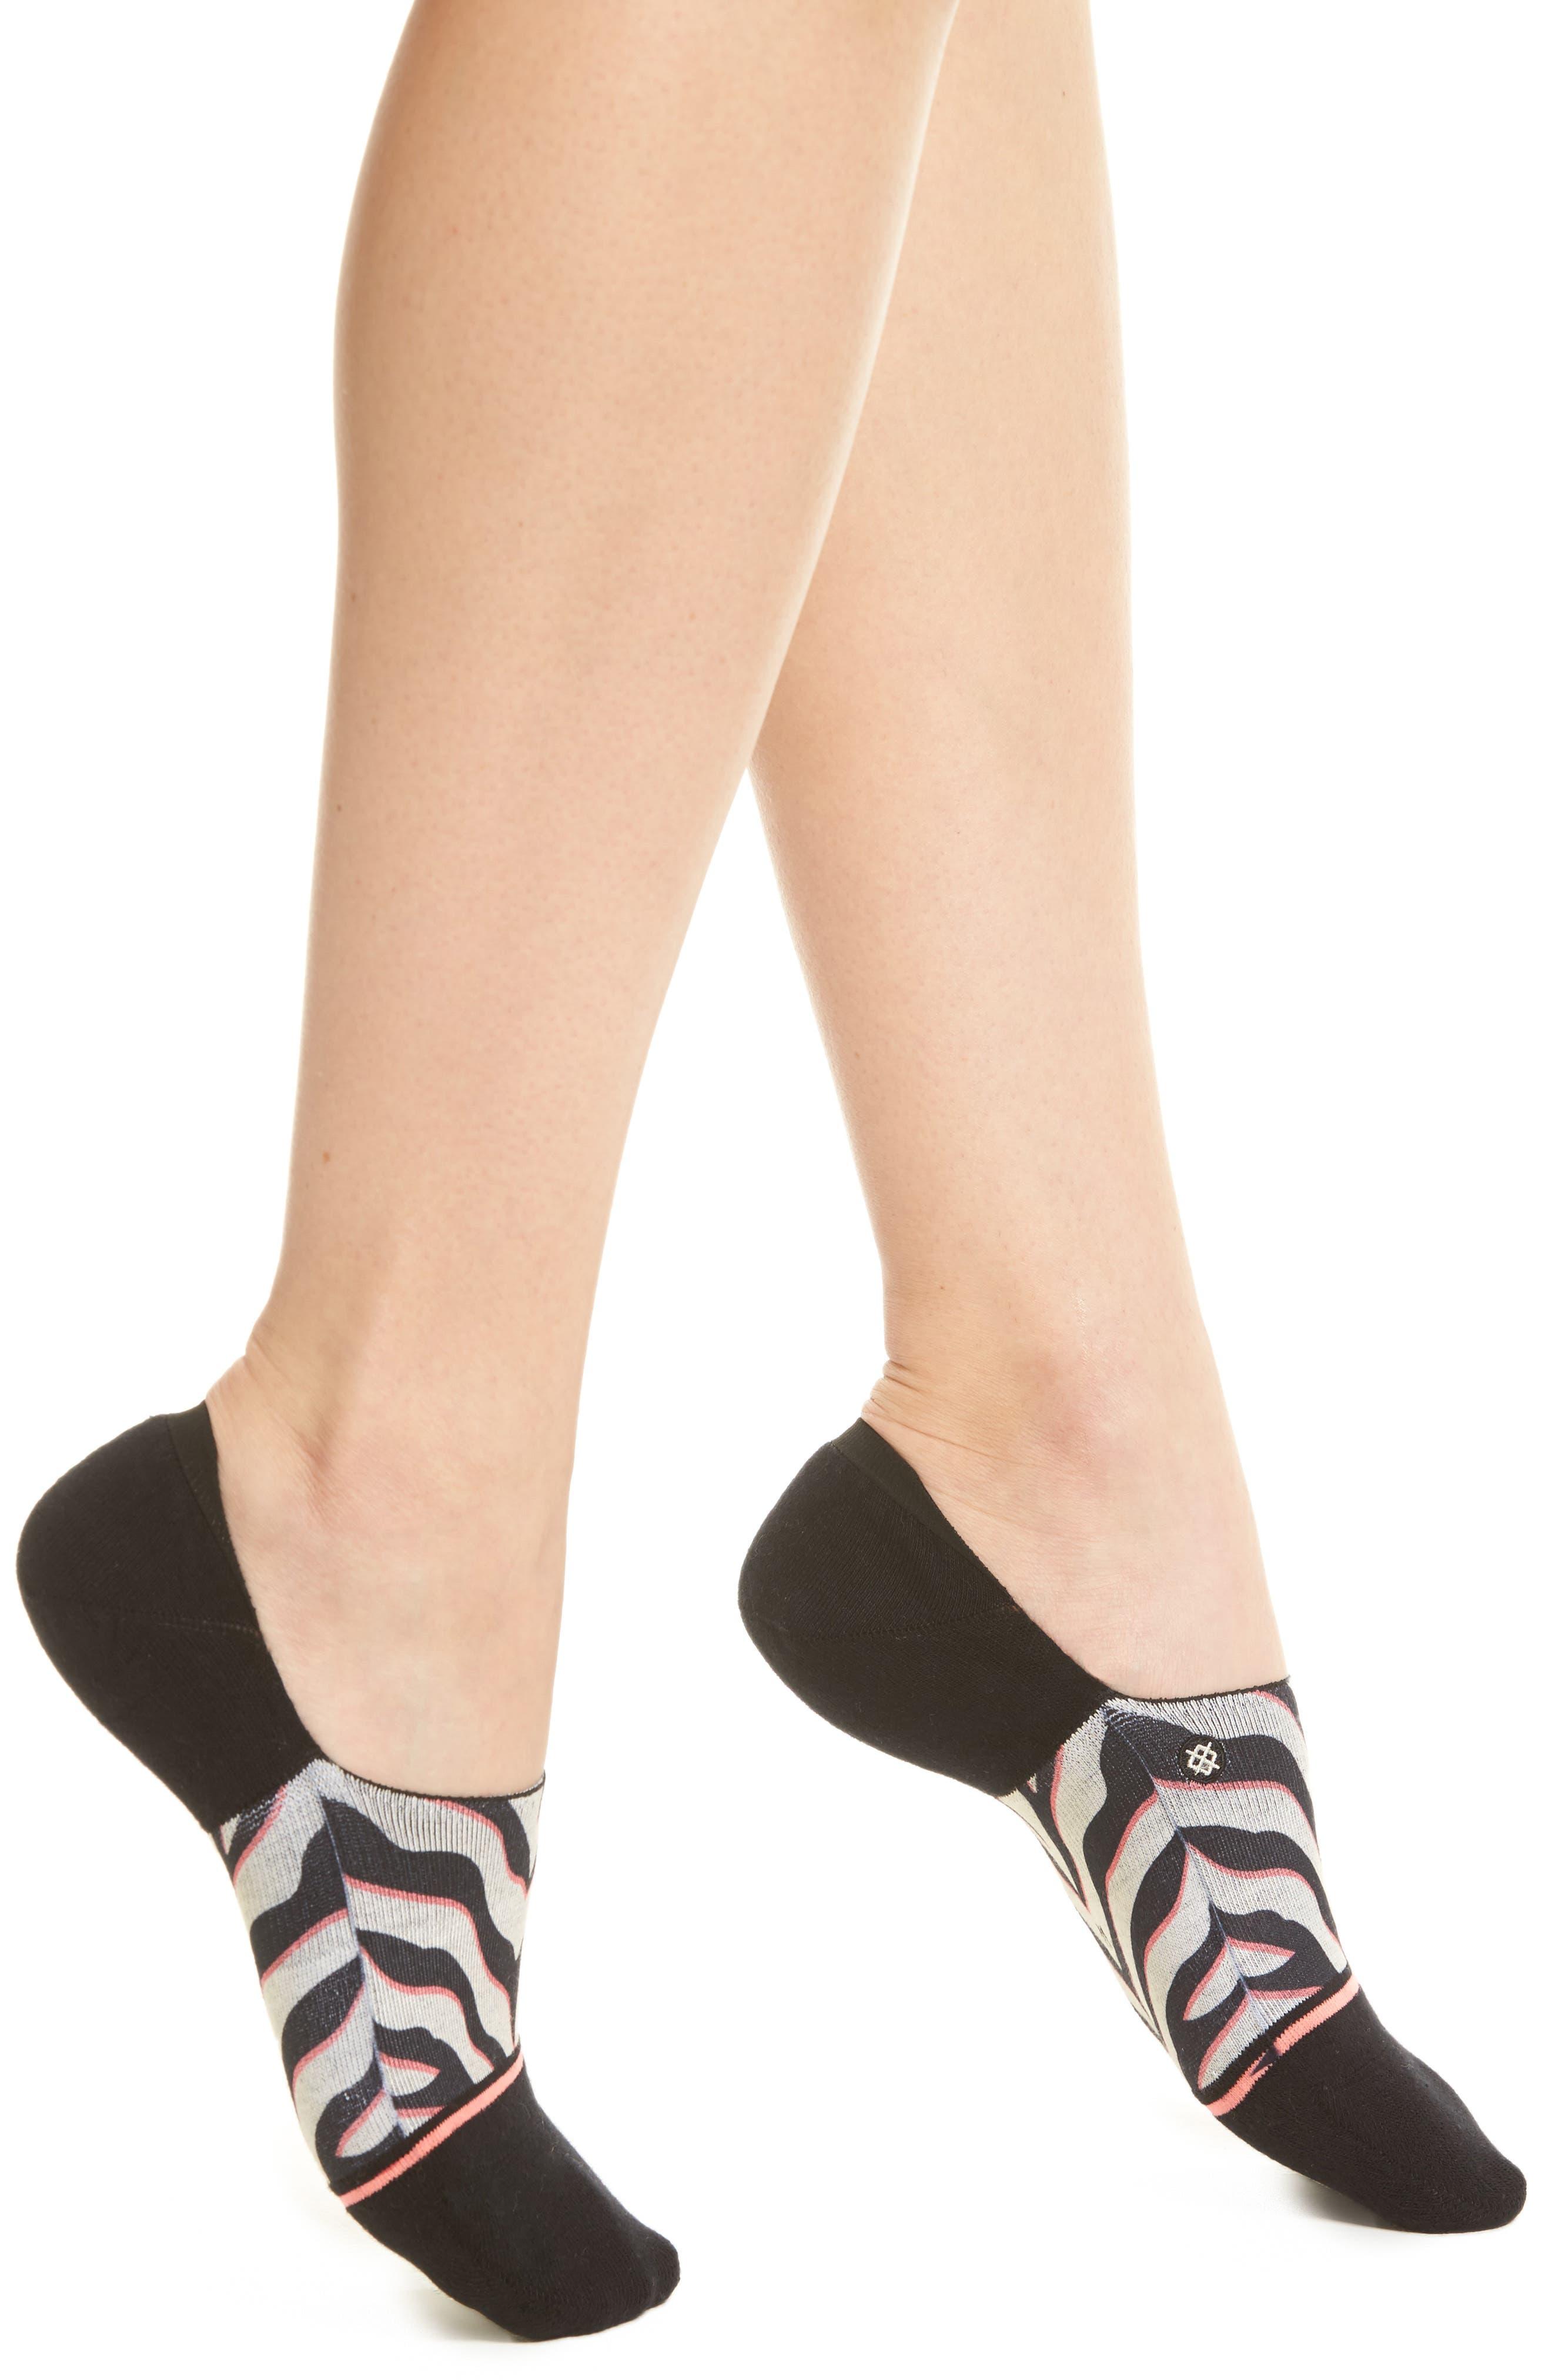 Checotah Super Invisible No-Show Socks,                             Main thumbnail 1, color,                             BLACK